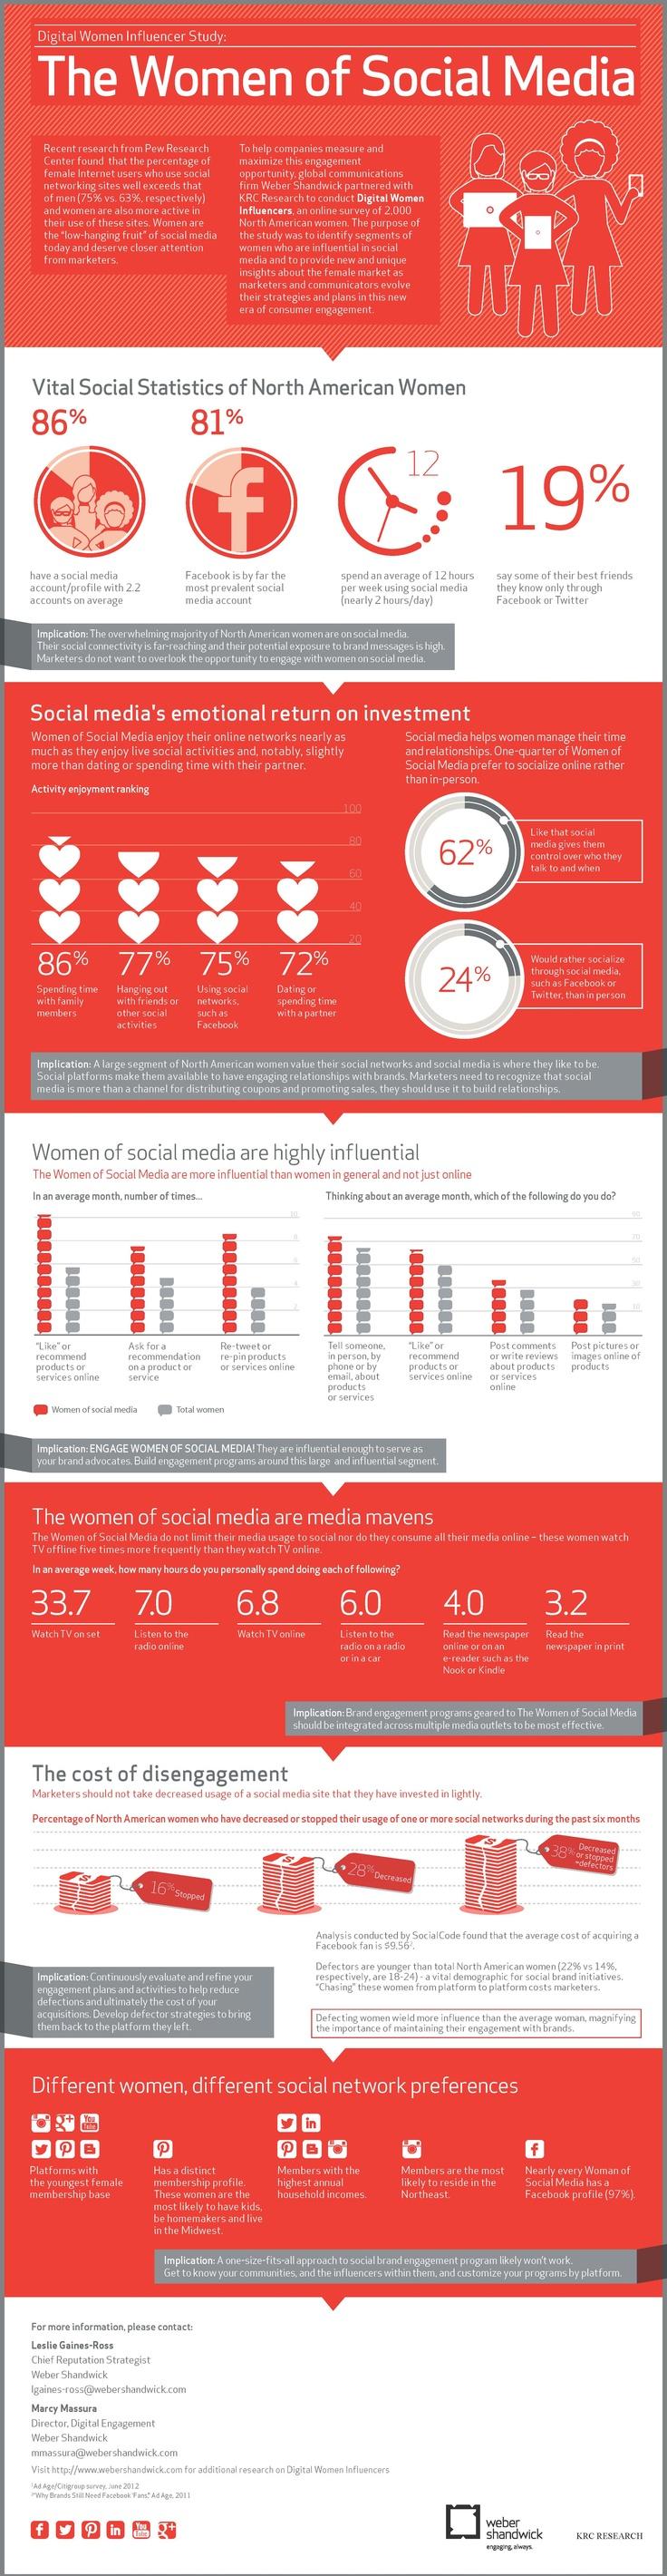 Digital Women Influencers Study - The Women of Social Media